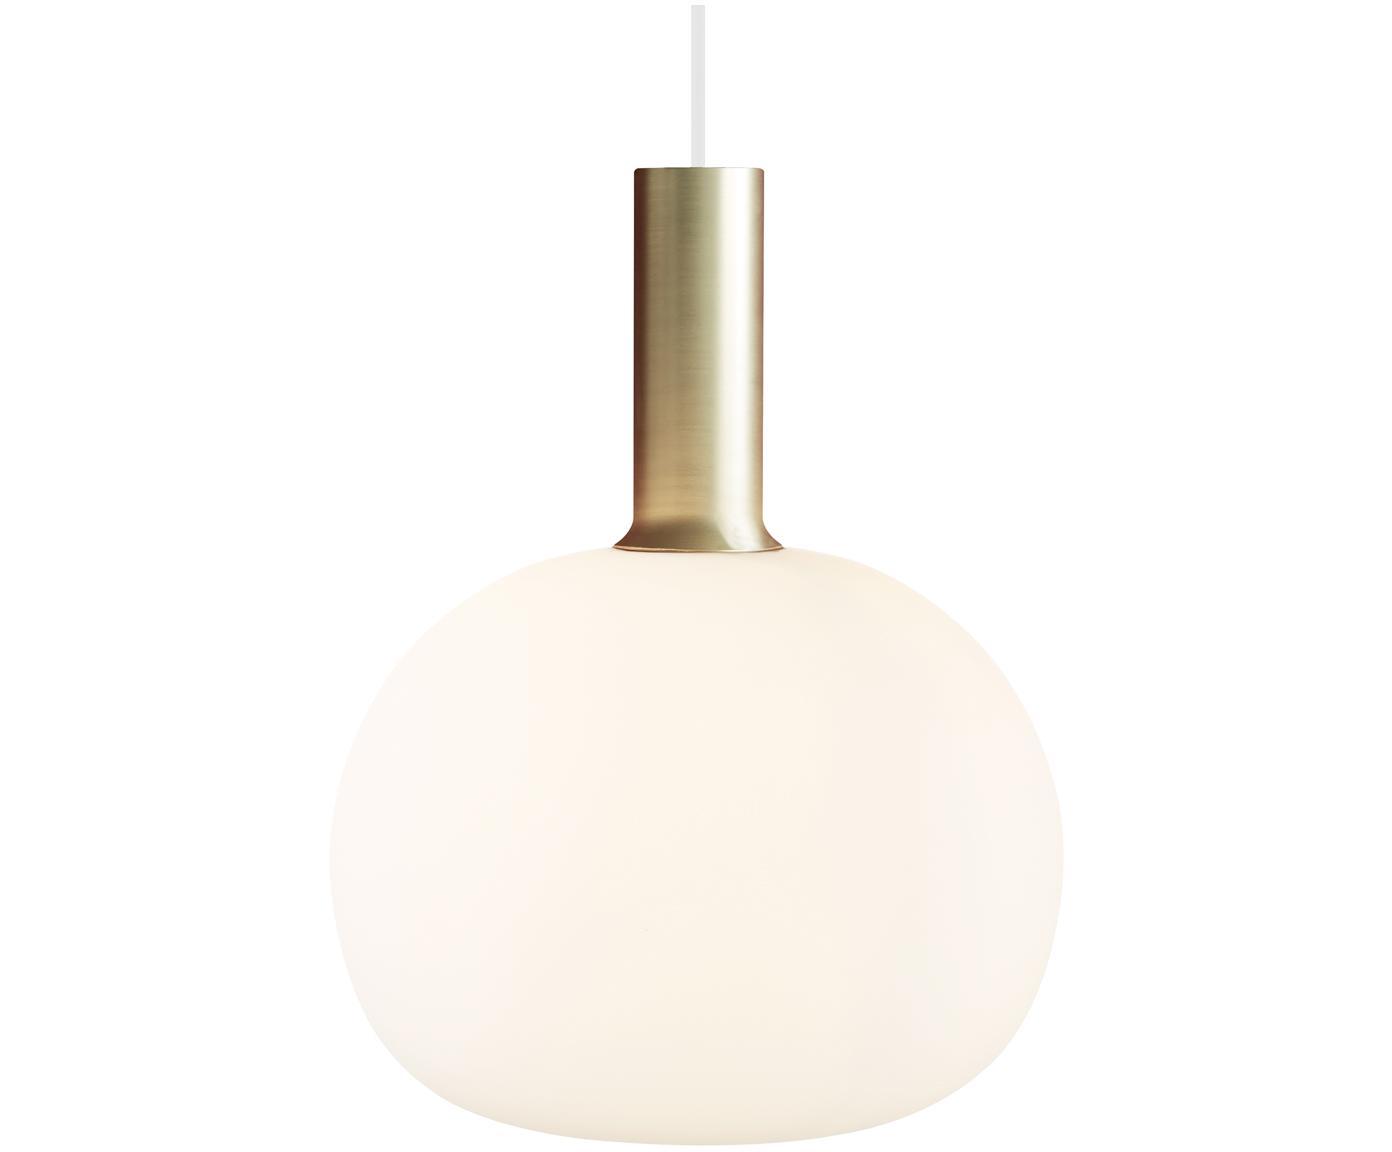 Lámpara de techo pequeña Alton, Fijación: latón o metal pintado Amb, Latón, blanco, Ø 25 x Al 33 cm